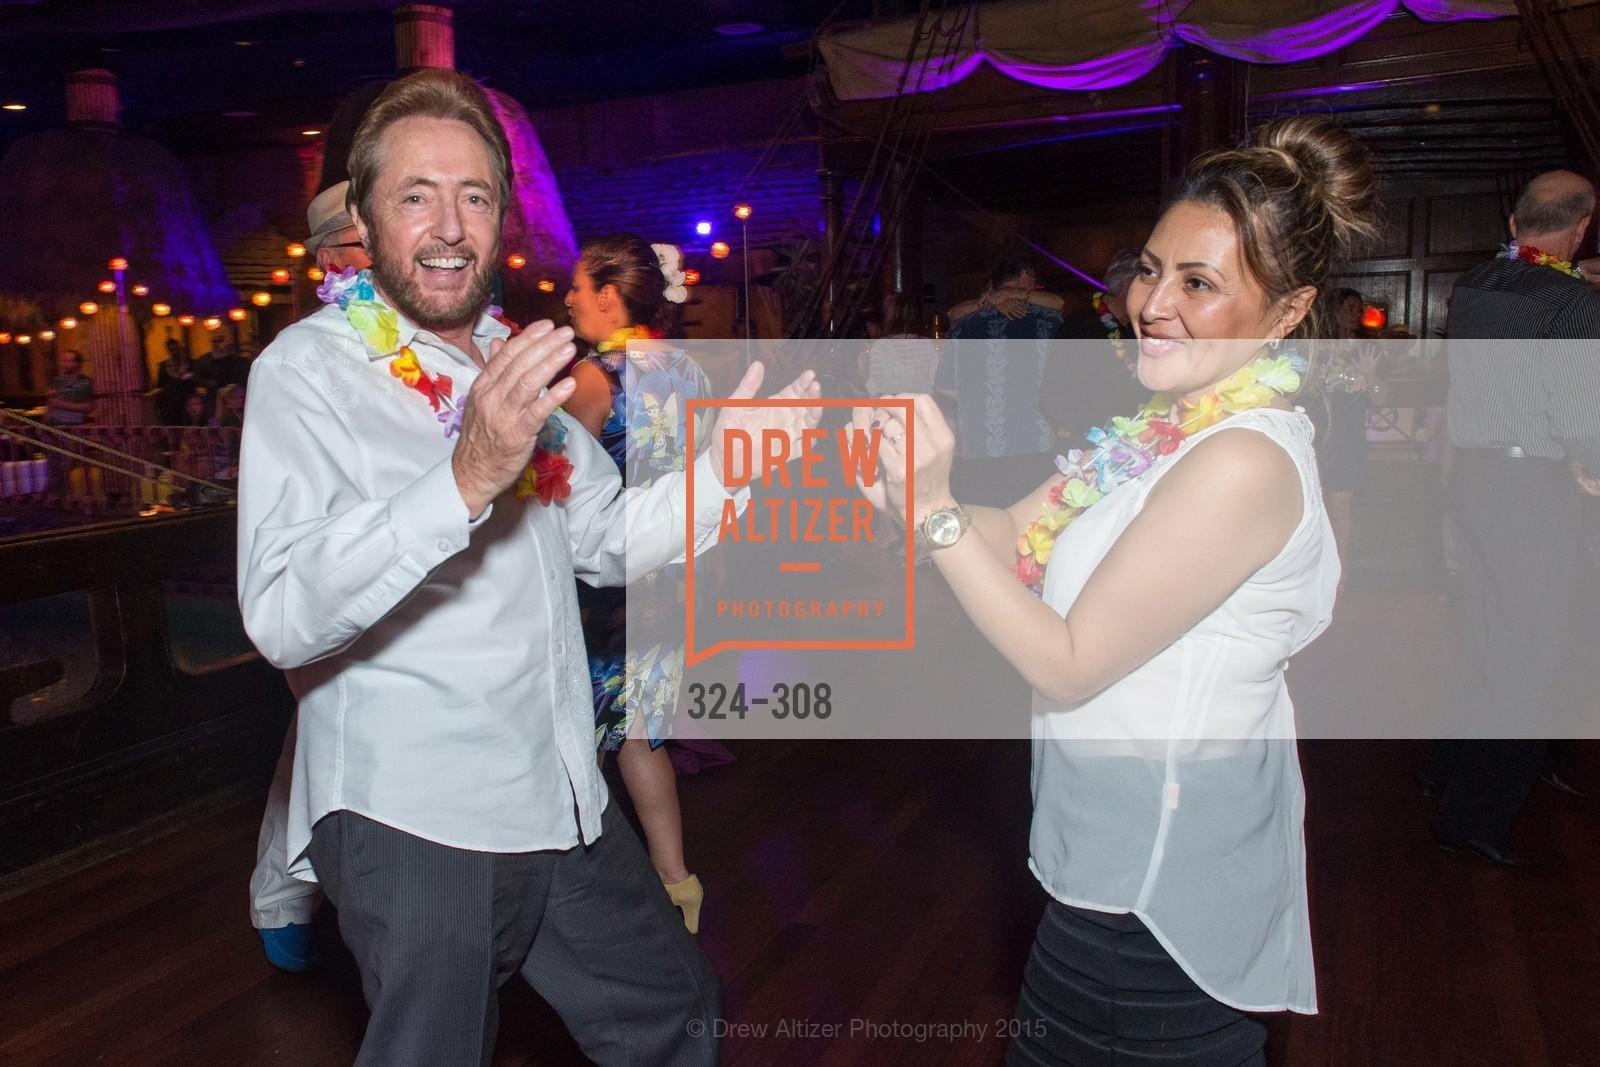 Dance Floor, Tonga Room & Hurricane Bar Celebrates 70 Years of Tiki Glory, Fairmont, September 23rd, 2015,Drew Altizer, Drew Altizer Photography, full-service agency, private events, San Francisco photographer, photographer california